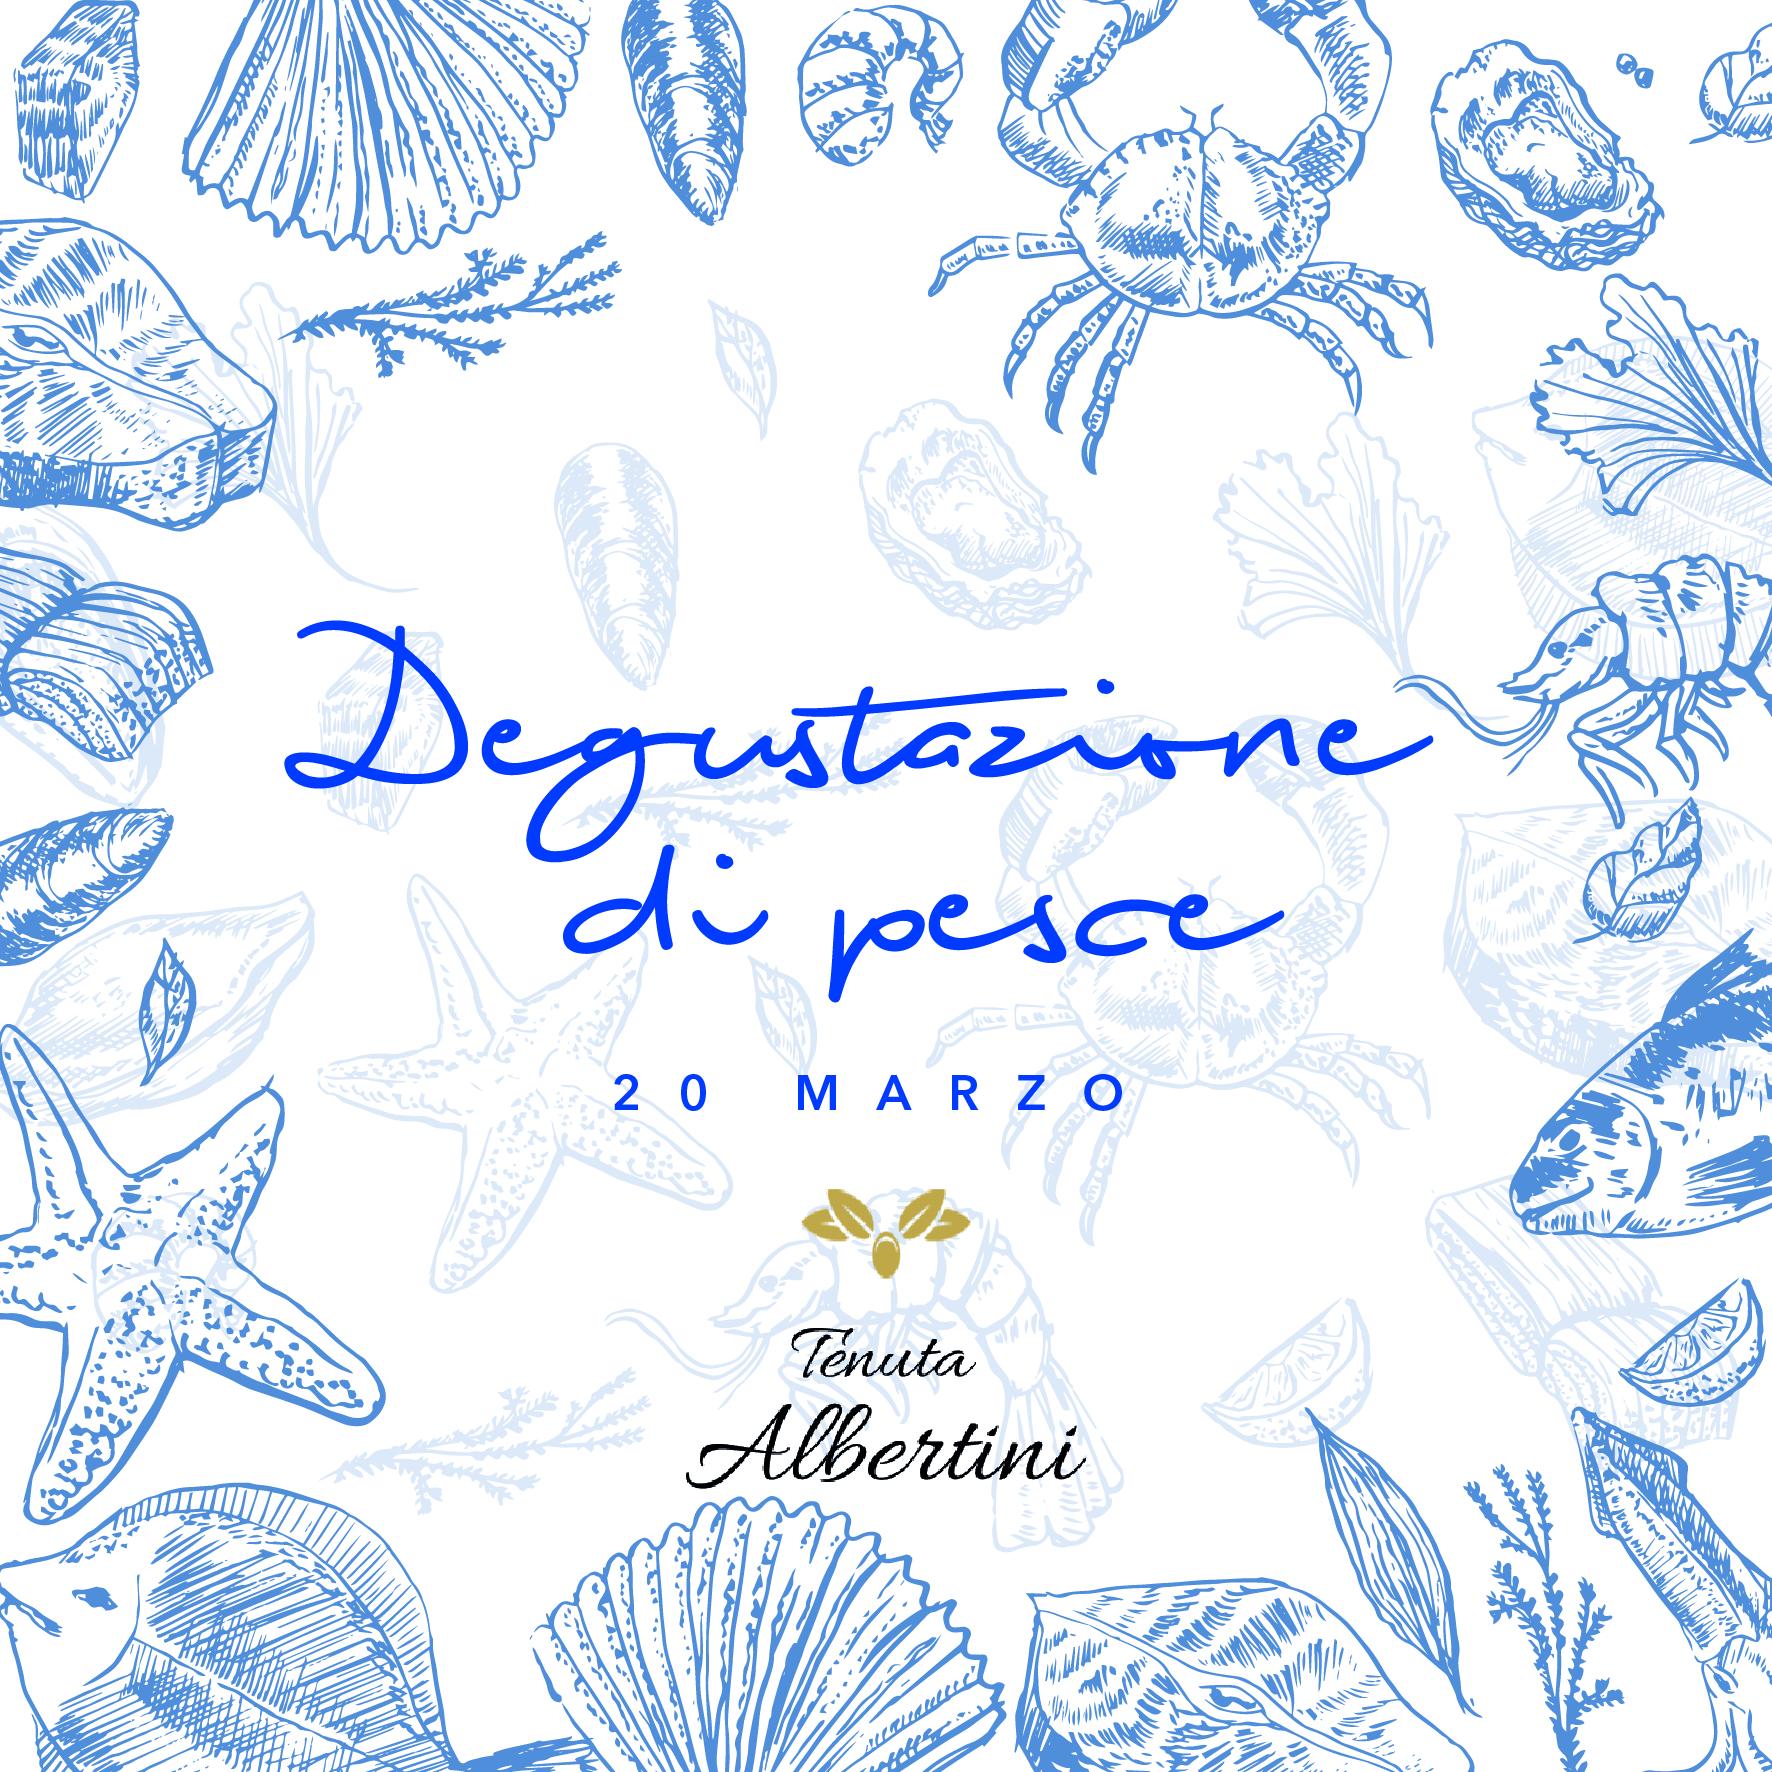 Degustazione di pesce Tenuta Albertini